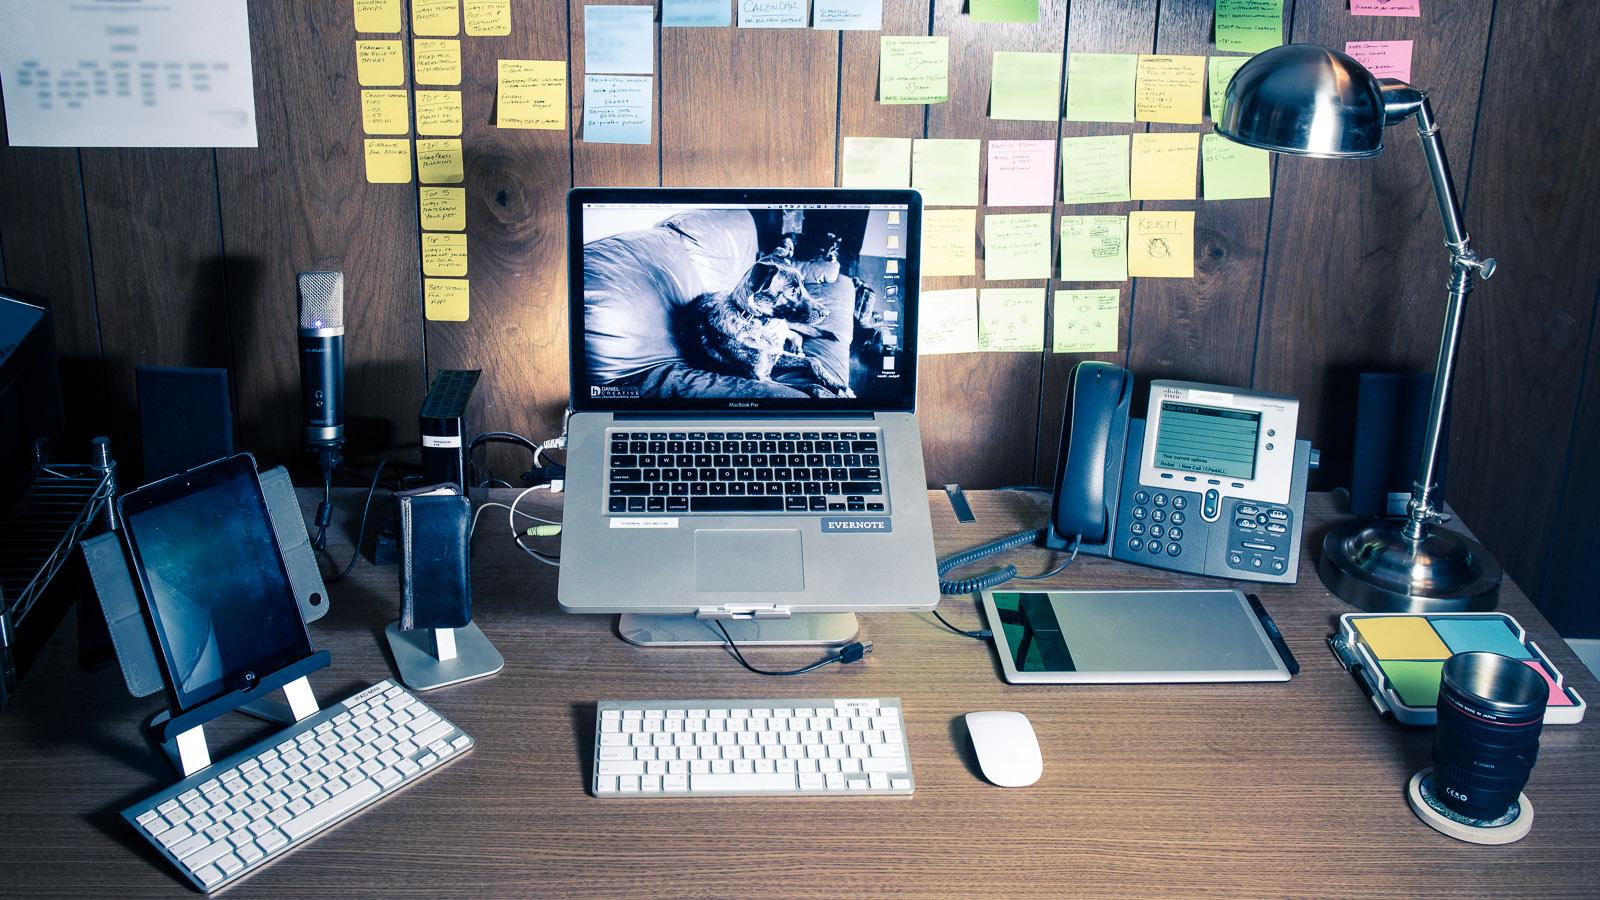 office meeting redrobot3d. Office Tumblr. Tumblr O Meeting Redrobot3d